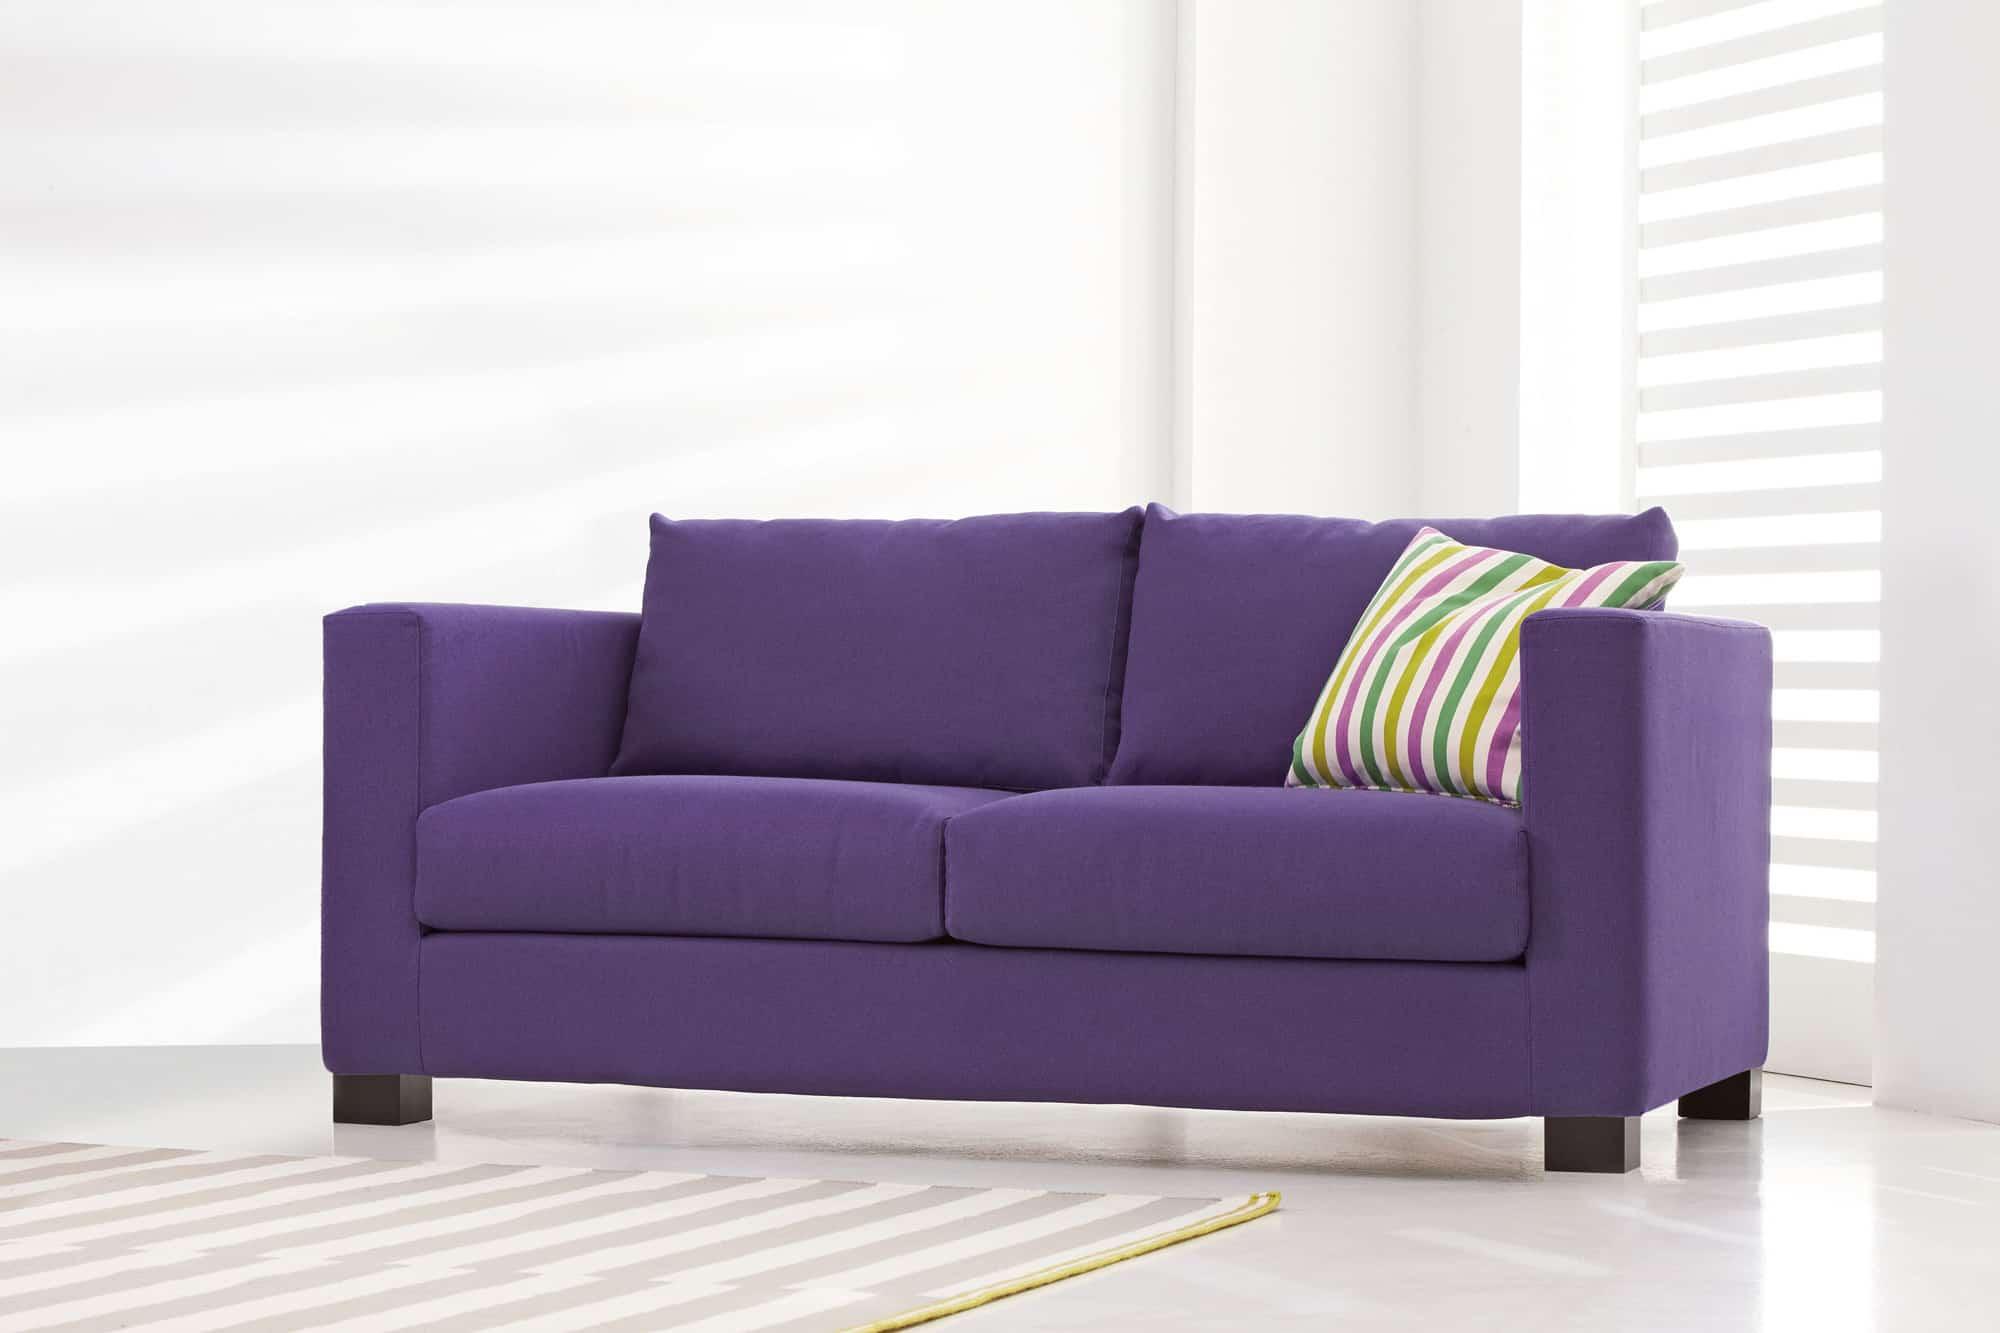 sofa serie catalpa marktex. Black Bedroom Furniture Sets. Home Design Ideas